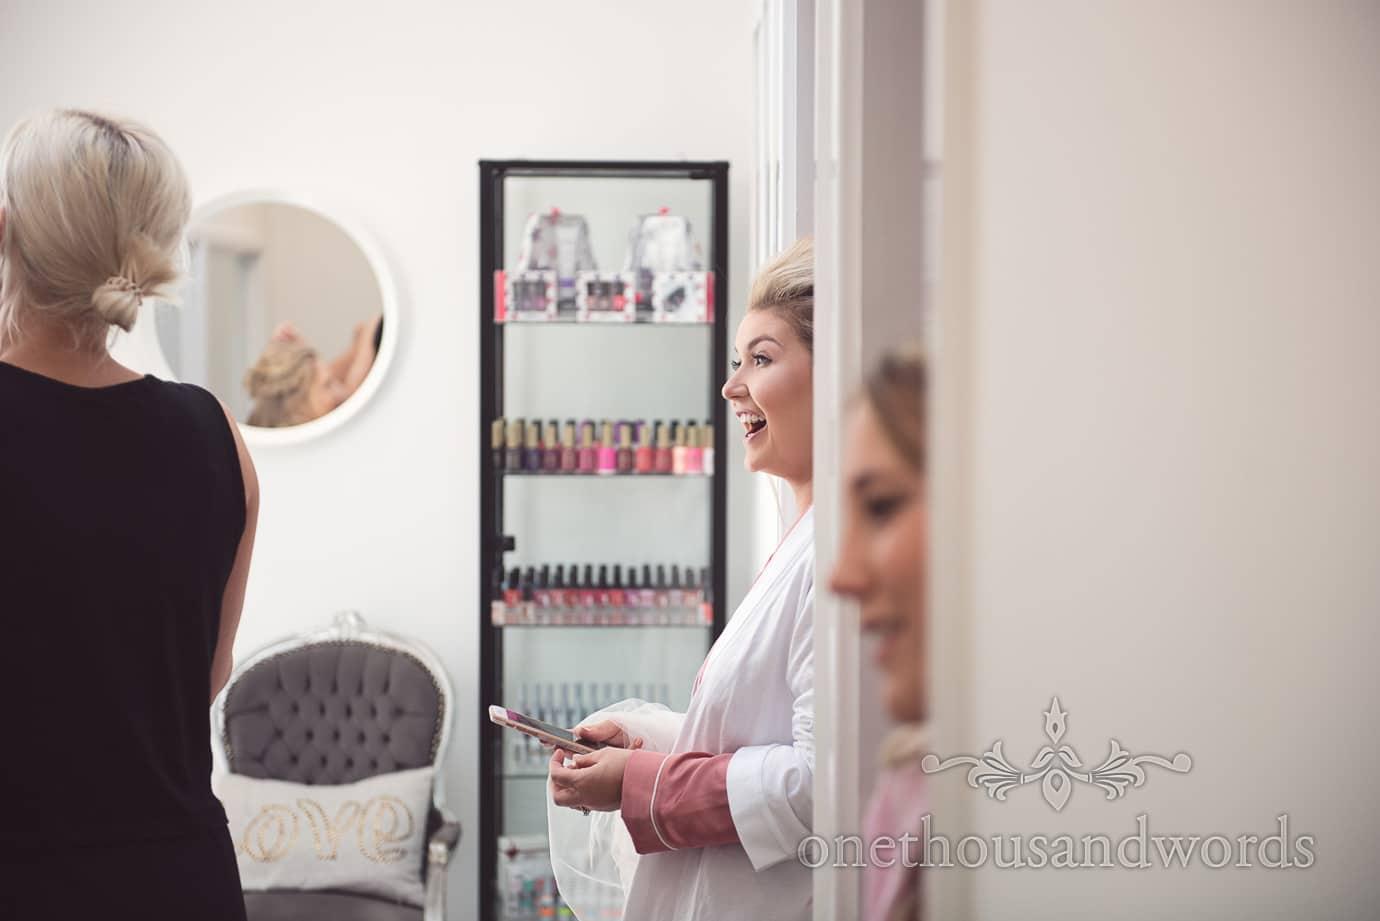 Bride in doorway at beauty salon laughs at wedding morning make-up preparations